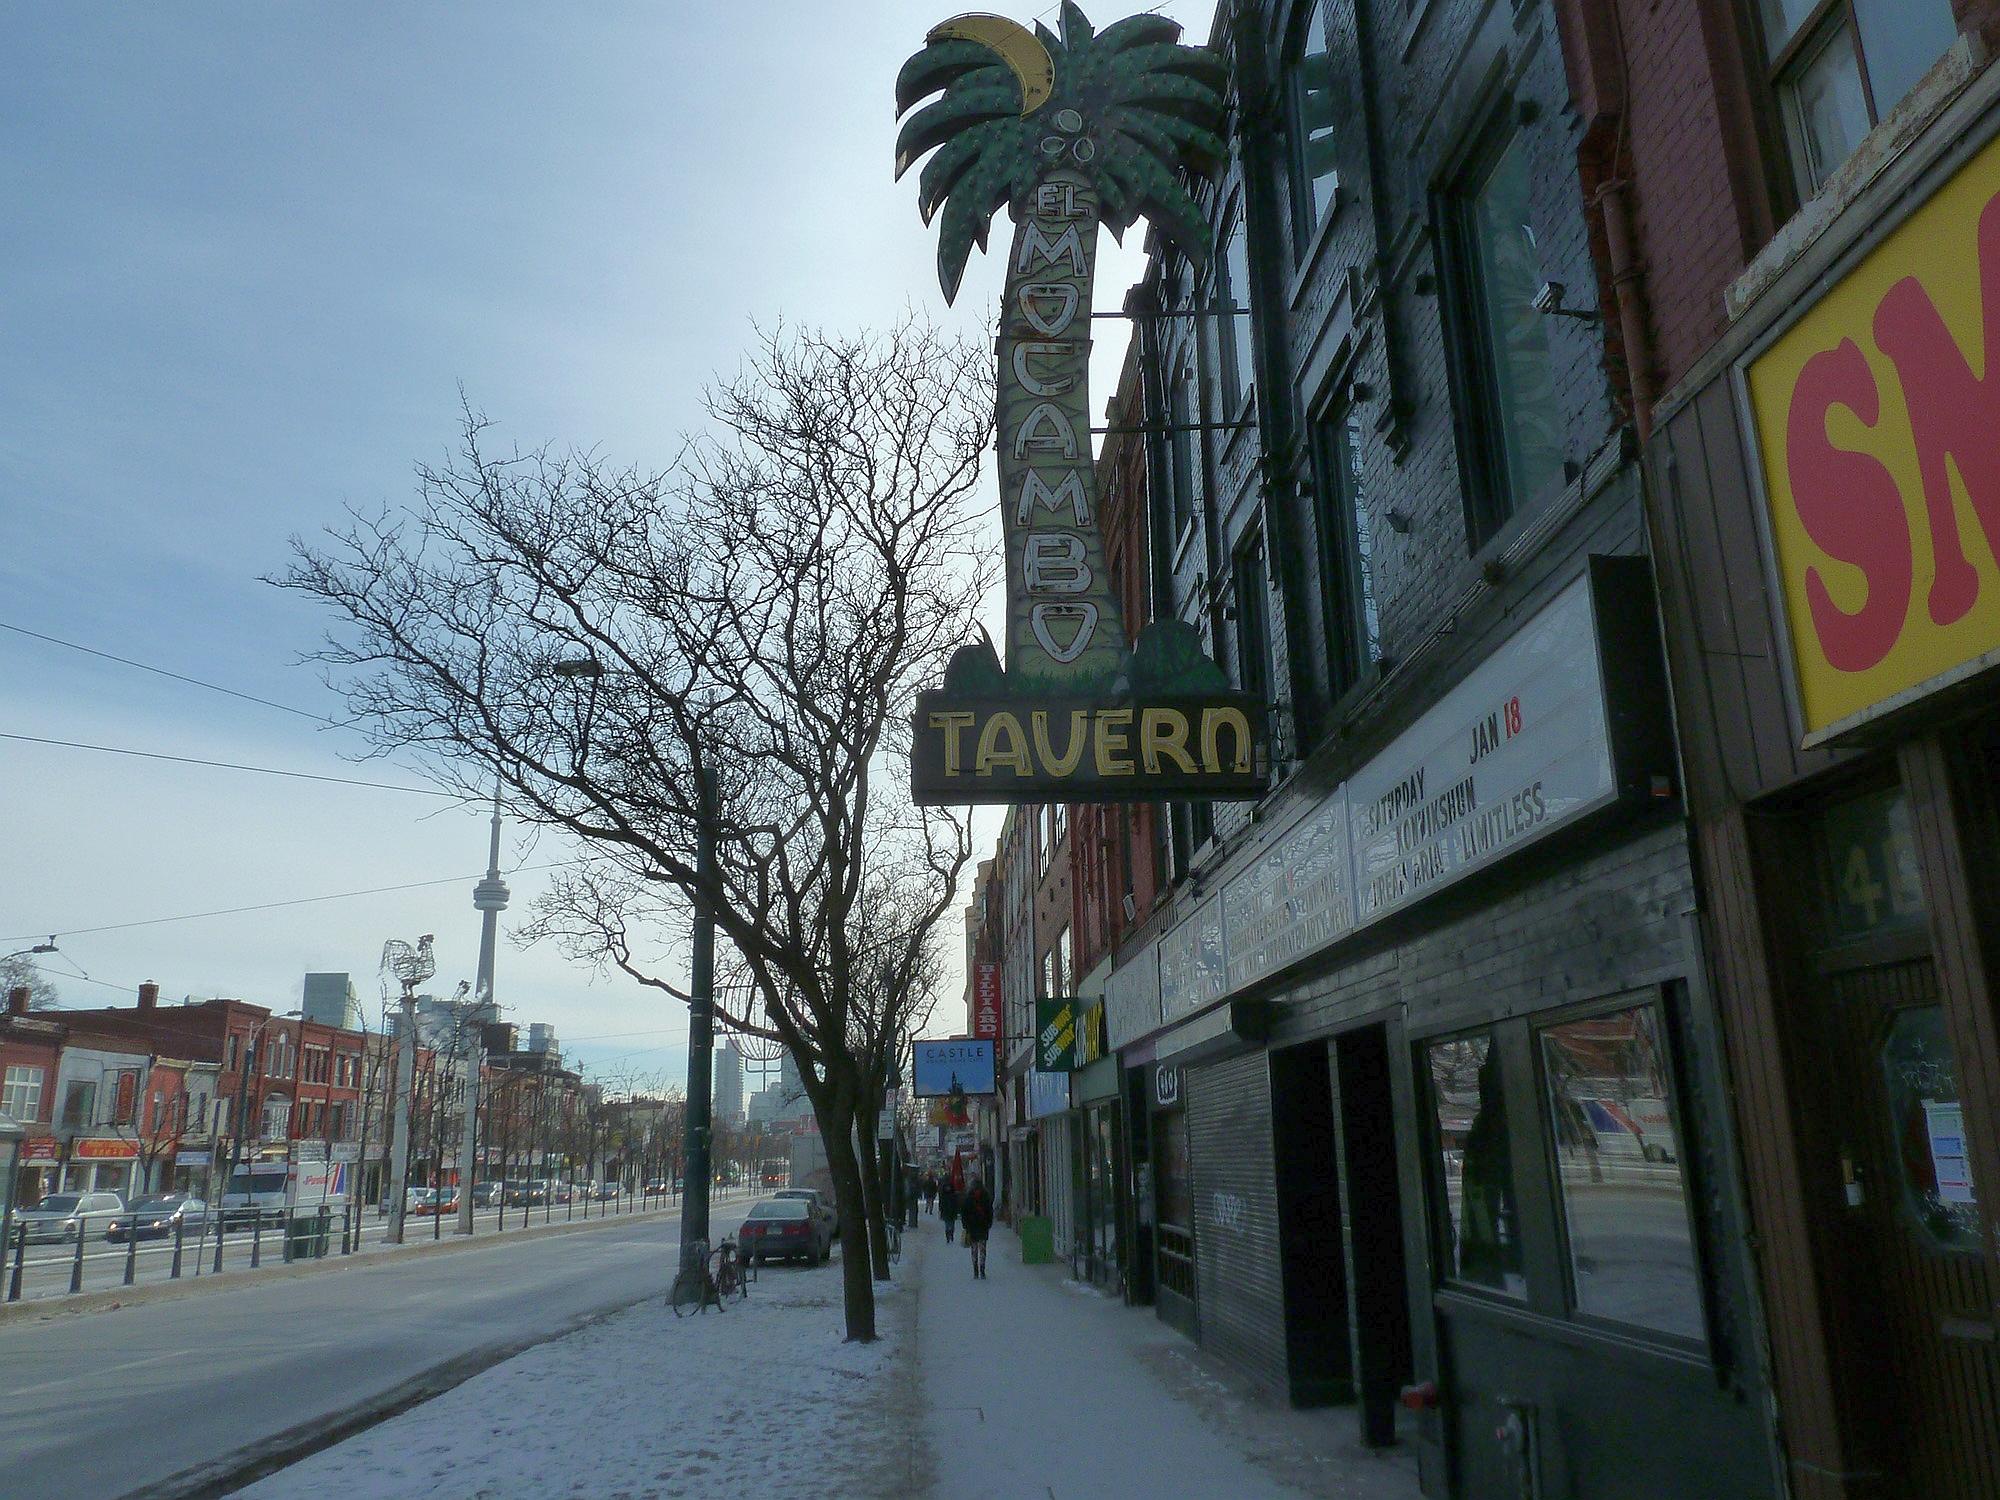 File:El Mocambo Tavern, Toronto.jpg